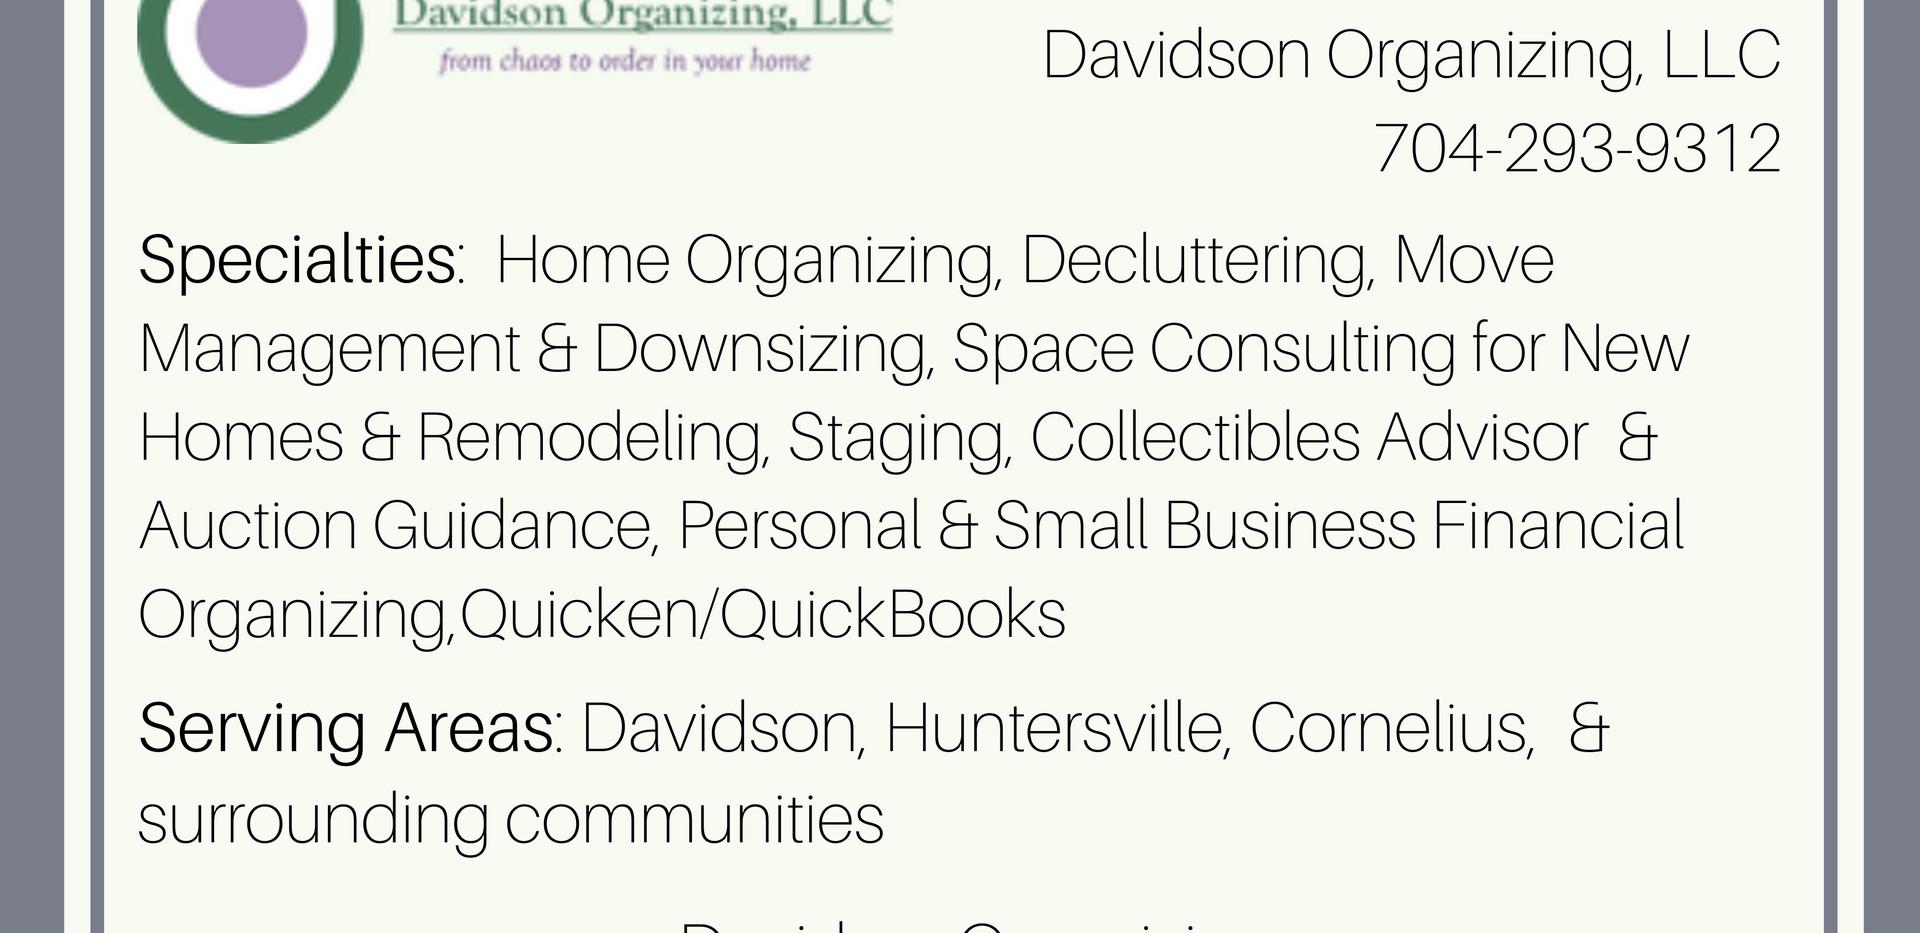 Davidson Organizing 10-27-20.jpg